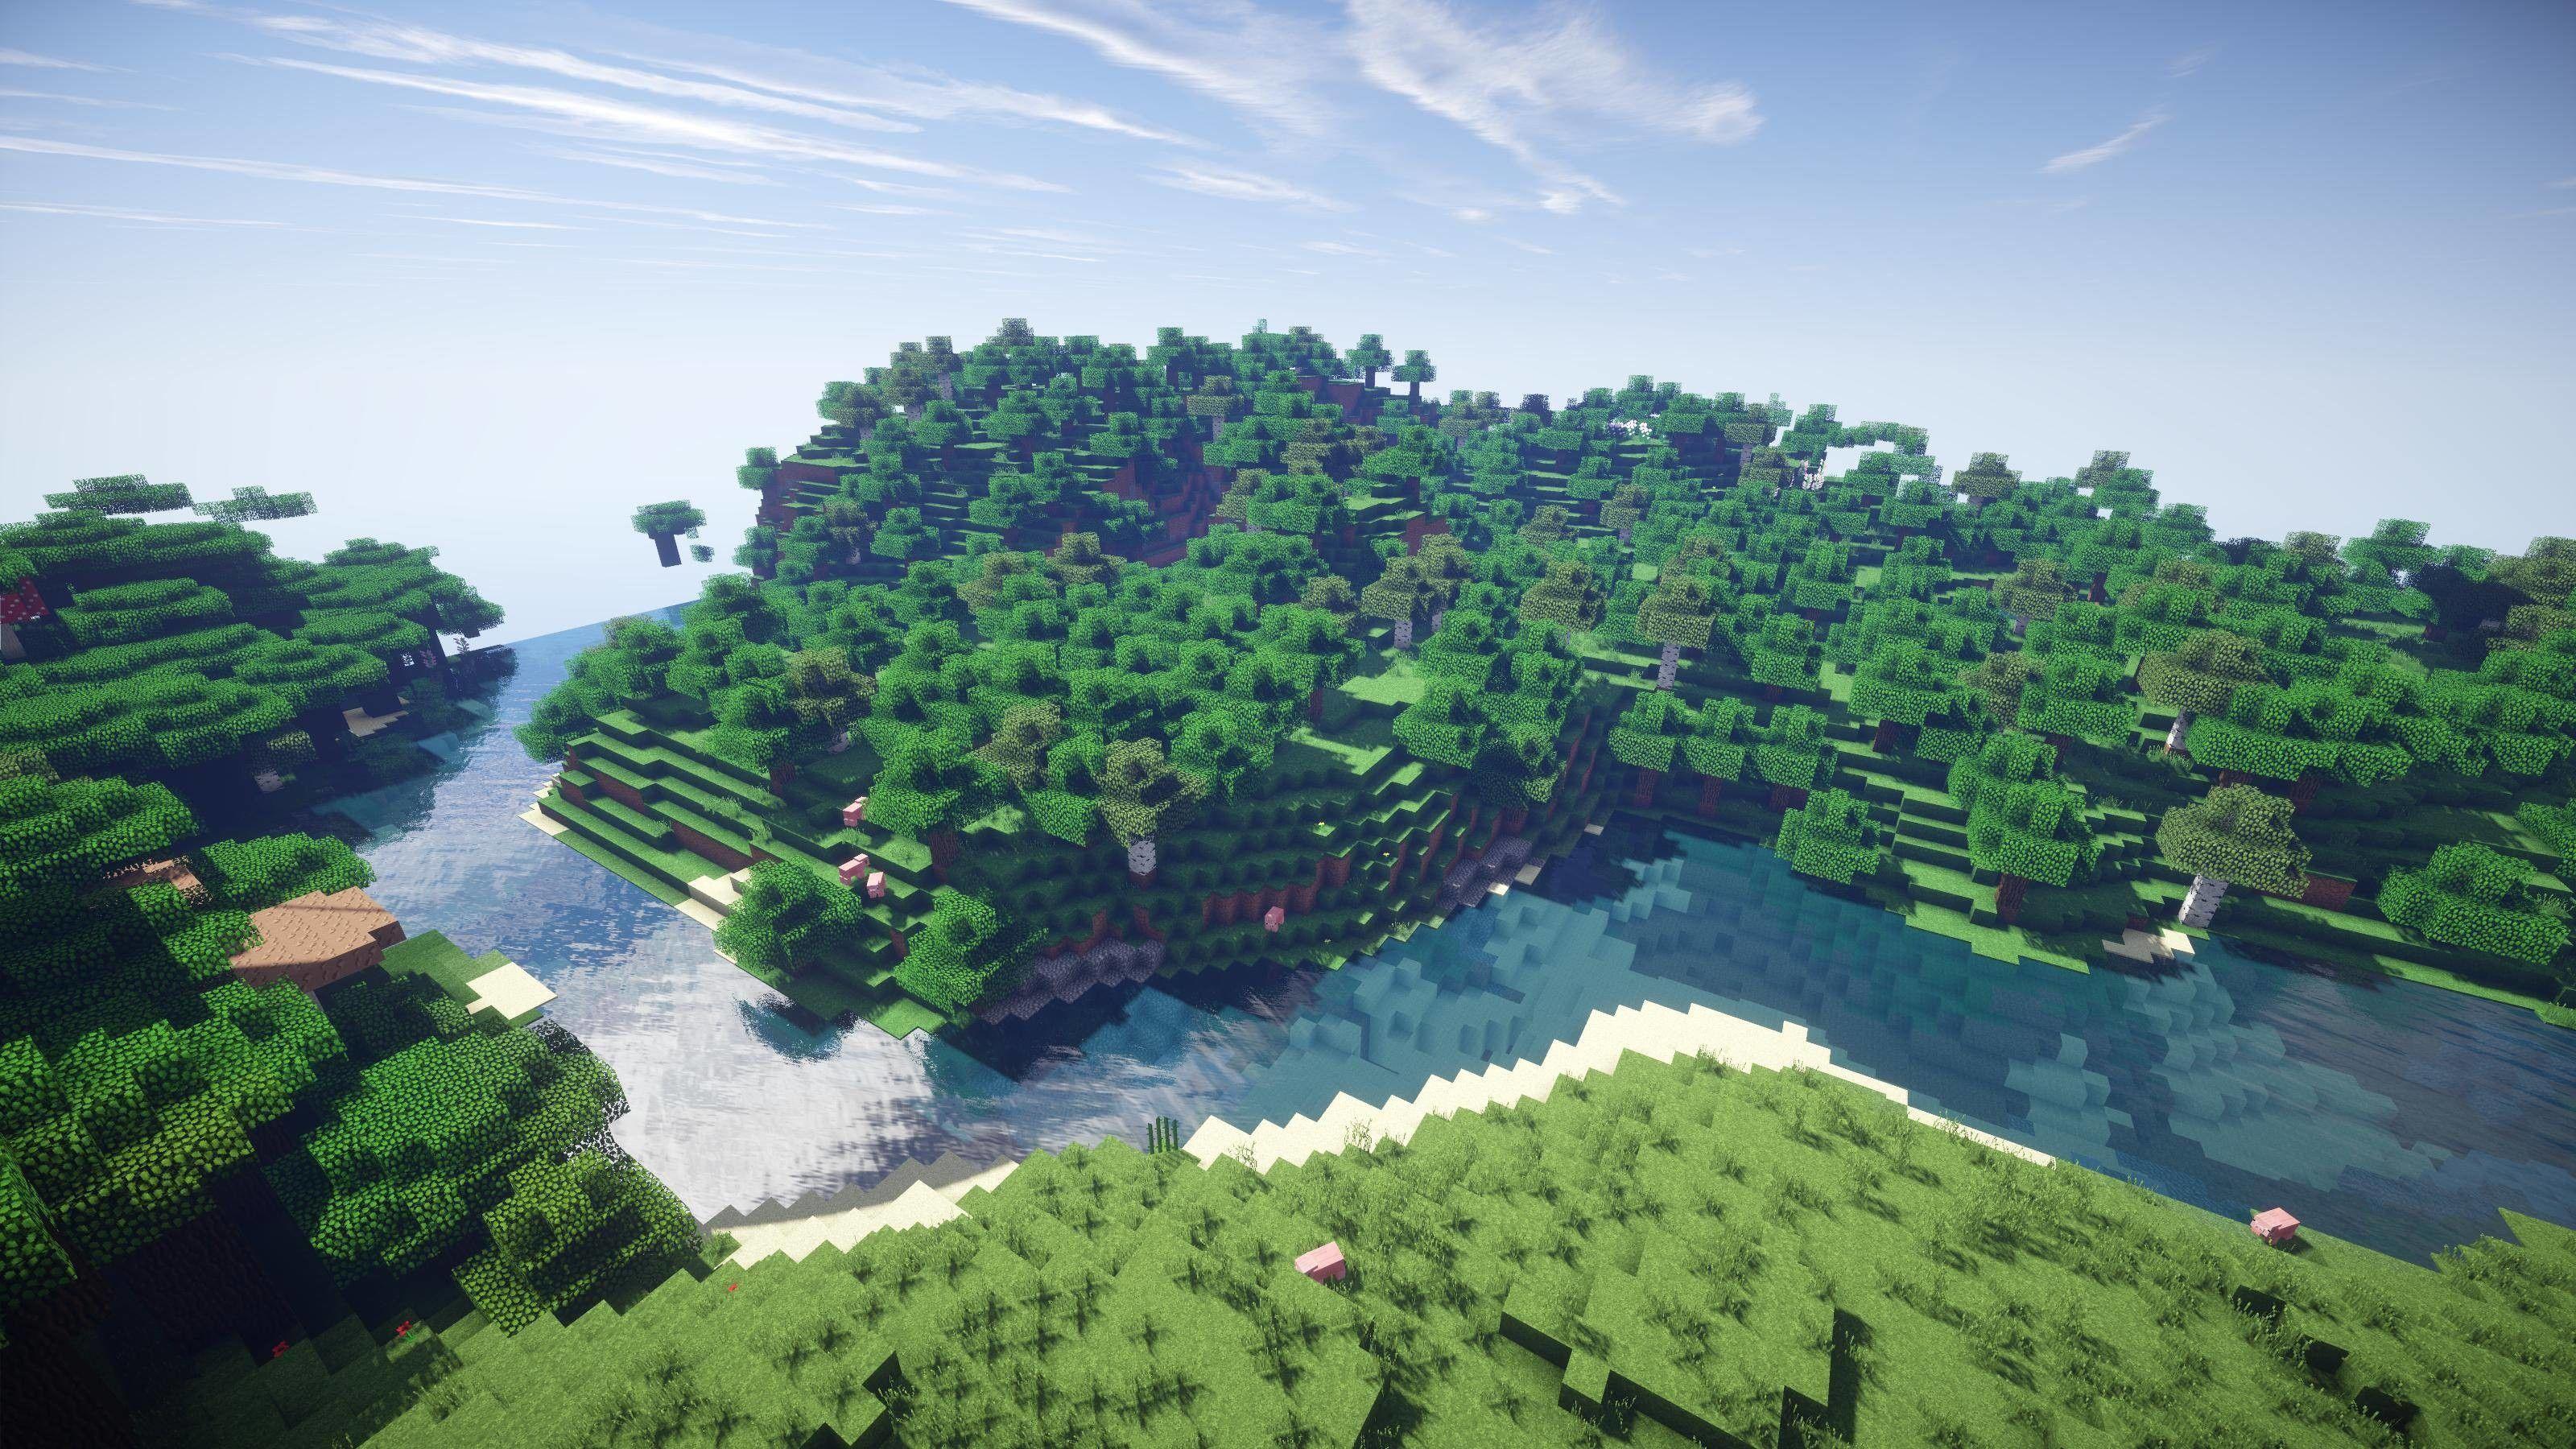 4K Minecraft Wallpapers   Top 4K Minecraft Backgrounds 3200x1800